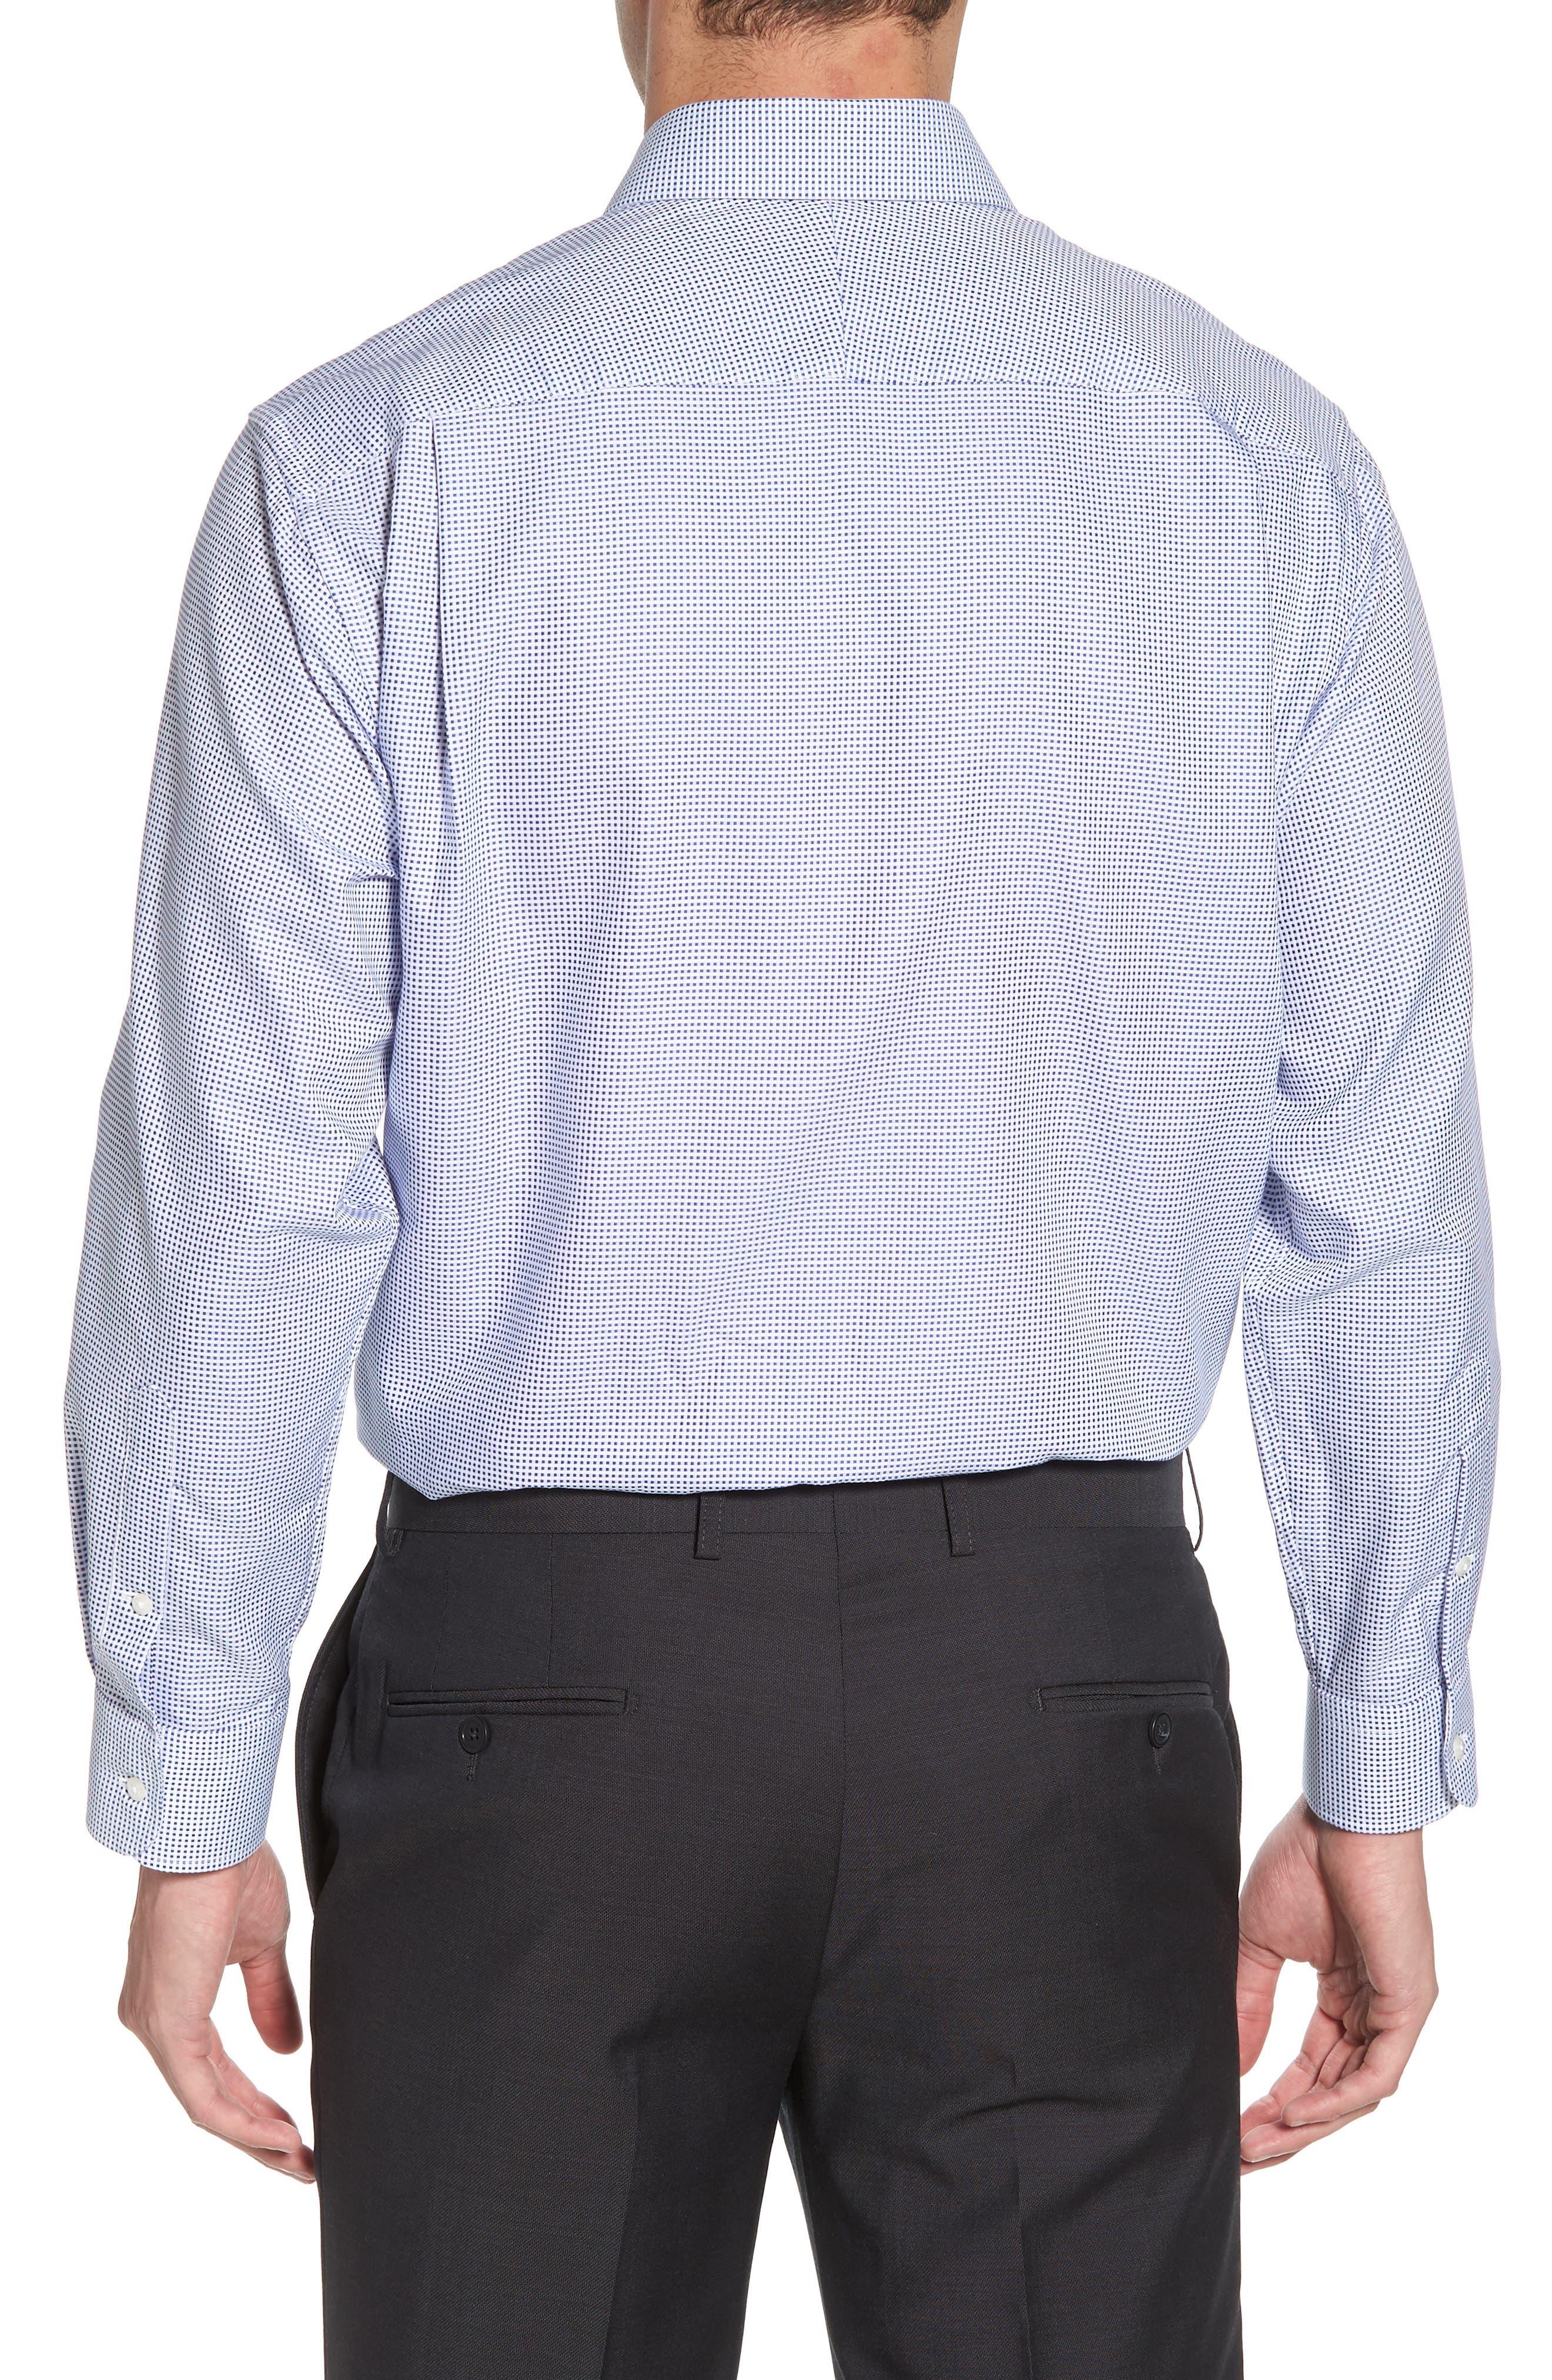 Alternate Image 2  - Nordstrom Men's Shop Classic Fit Microcheck Dress Shirt